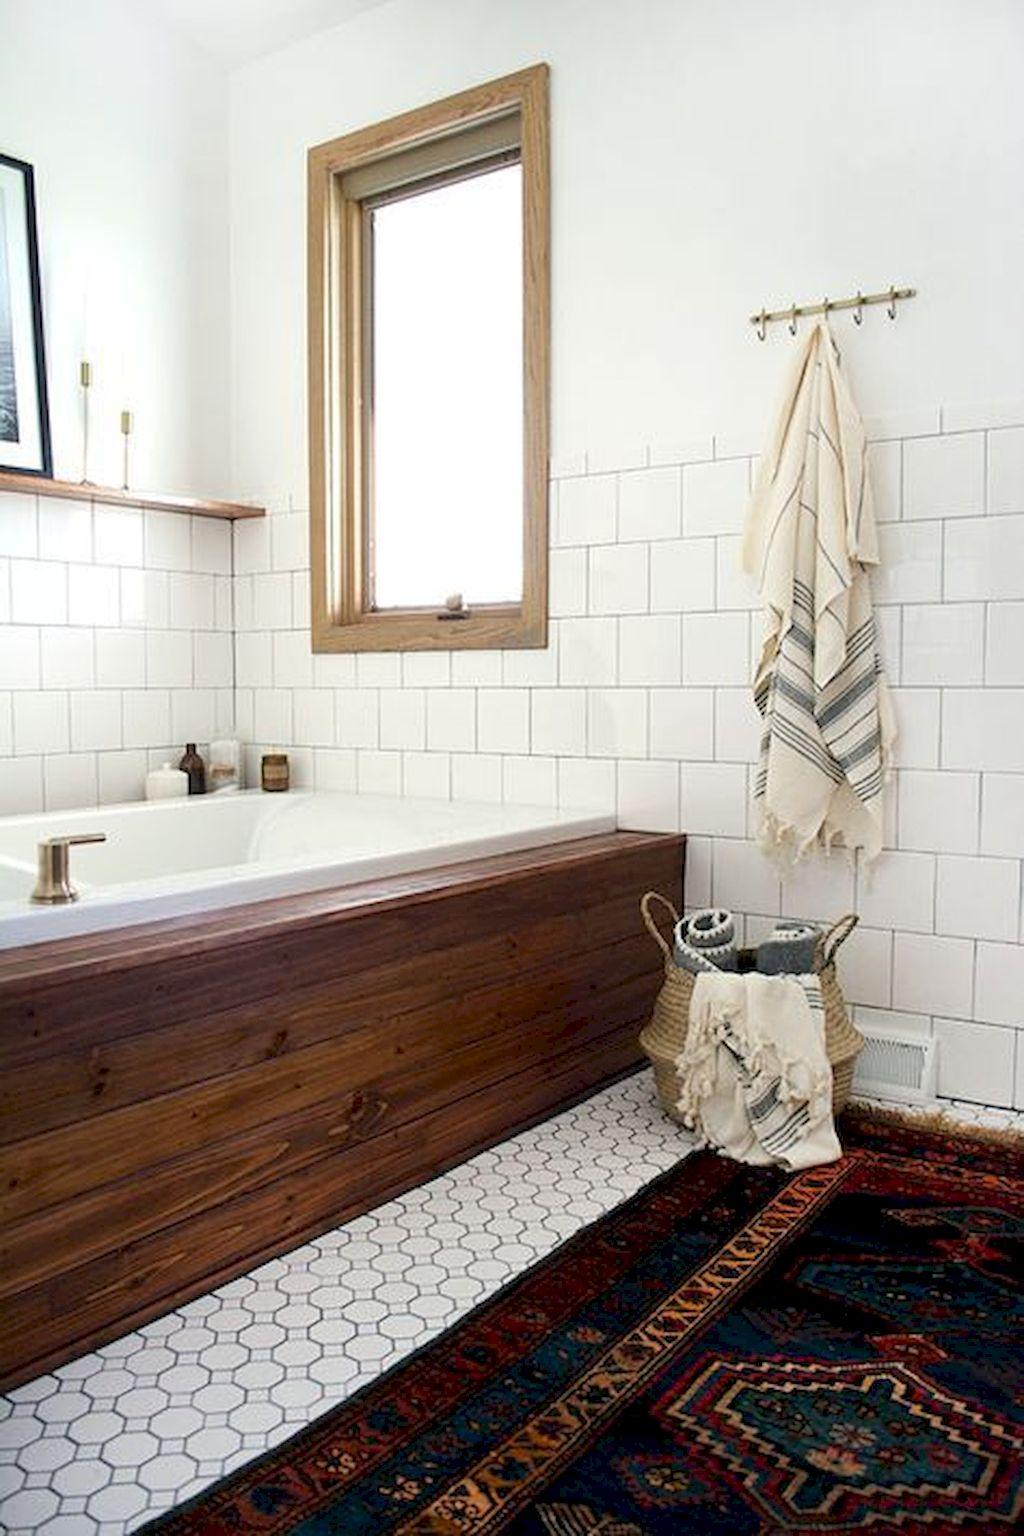 Marvelous Stylish Color Scheme For Your Bathroom